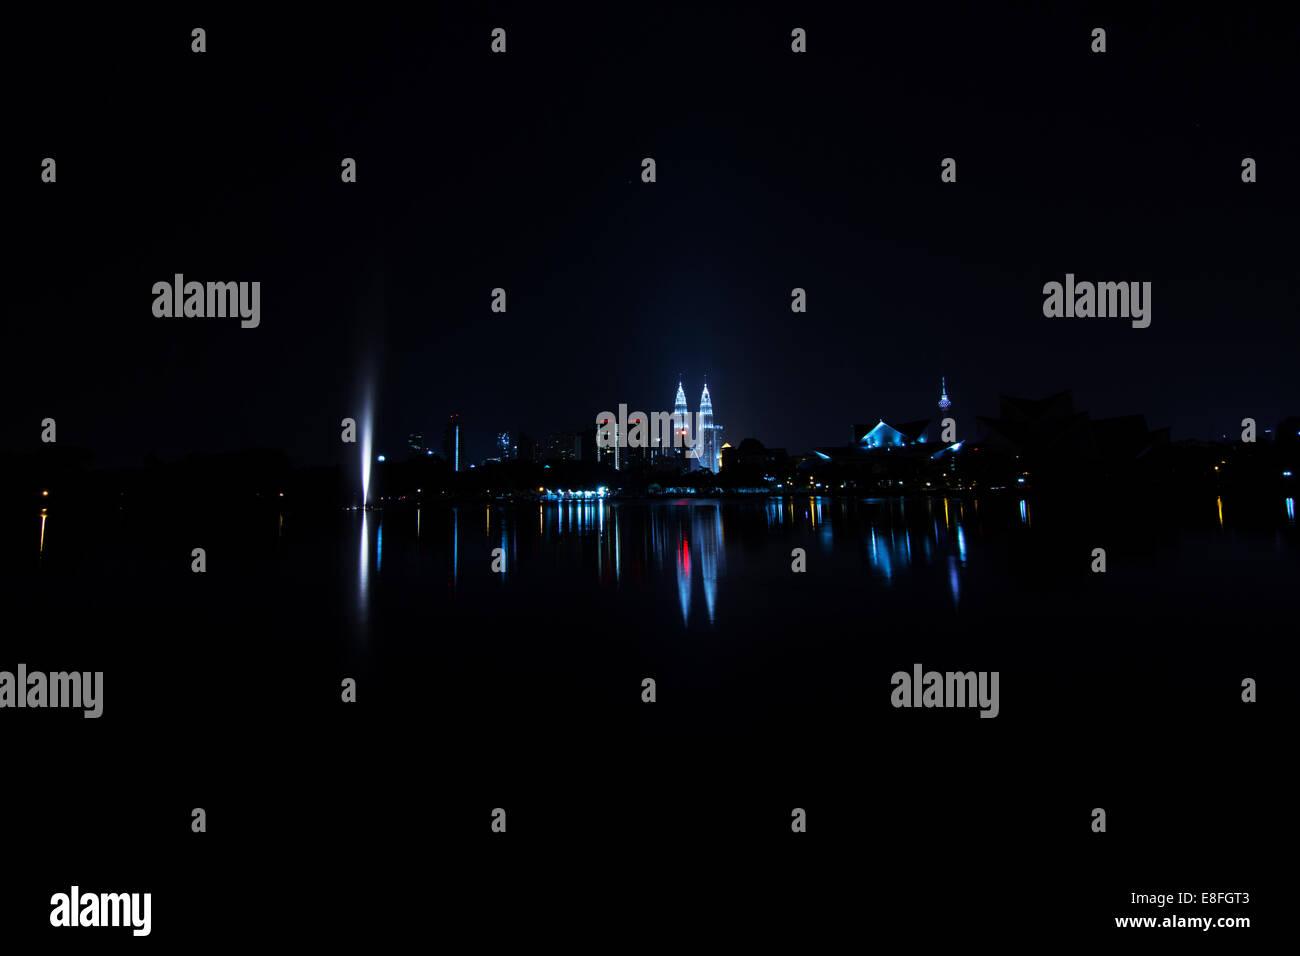 La Malaisie, Kuala Lumpur, City skyline at night Photo Stock